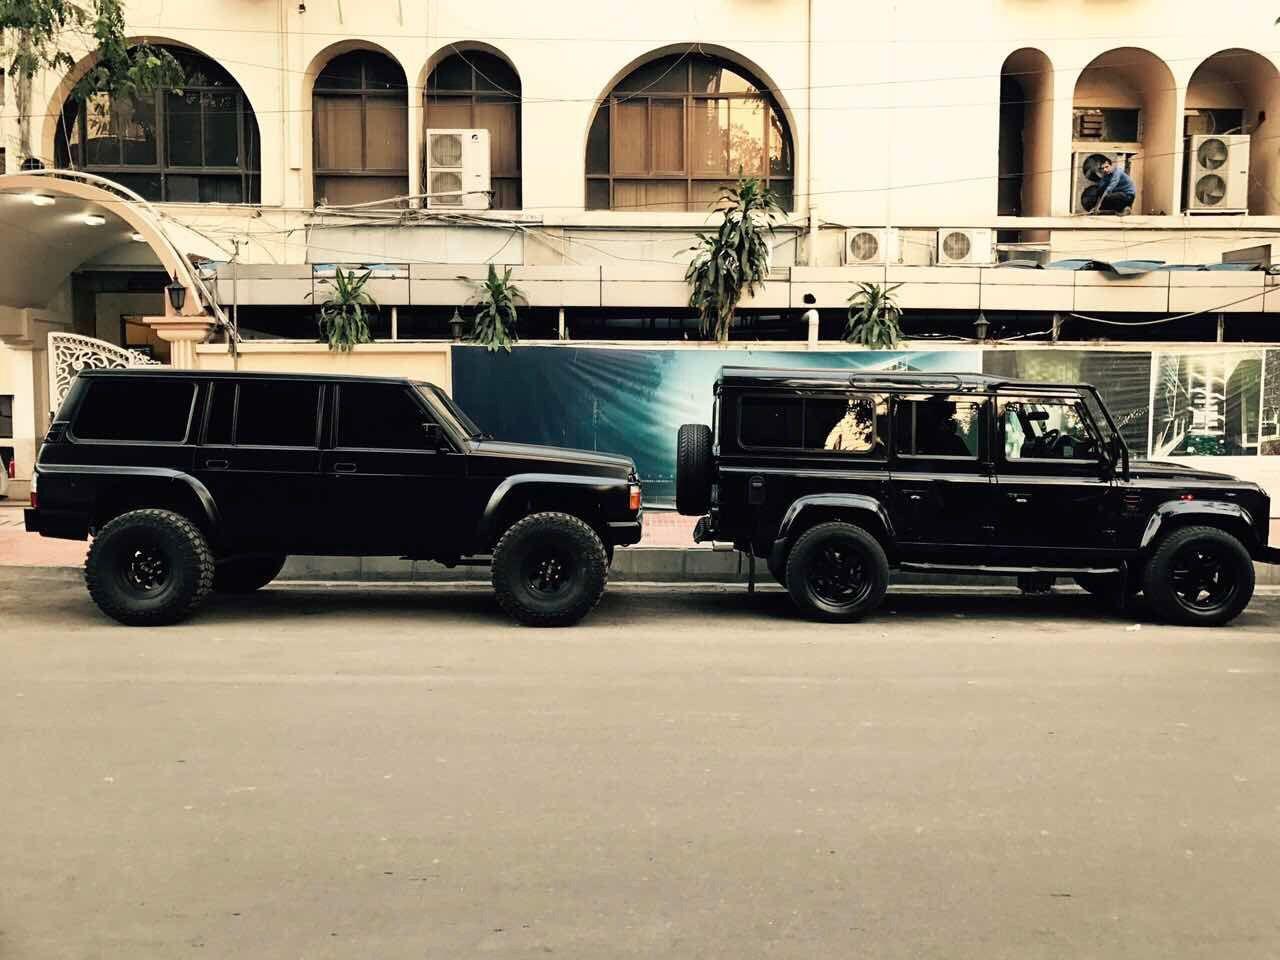 Monster Patrol Y60 Land Rover Defender Custom Nissan Patrol Nissan Nissan Patrol Y61